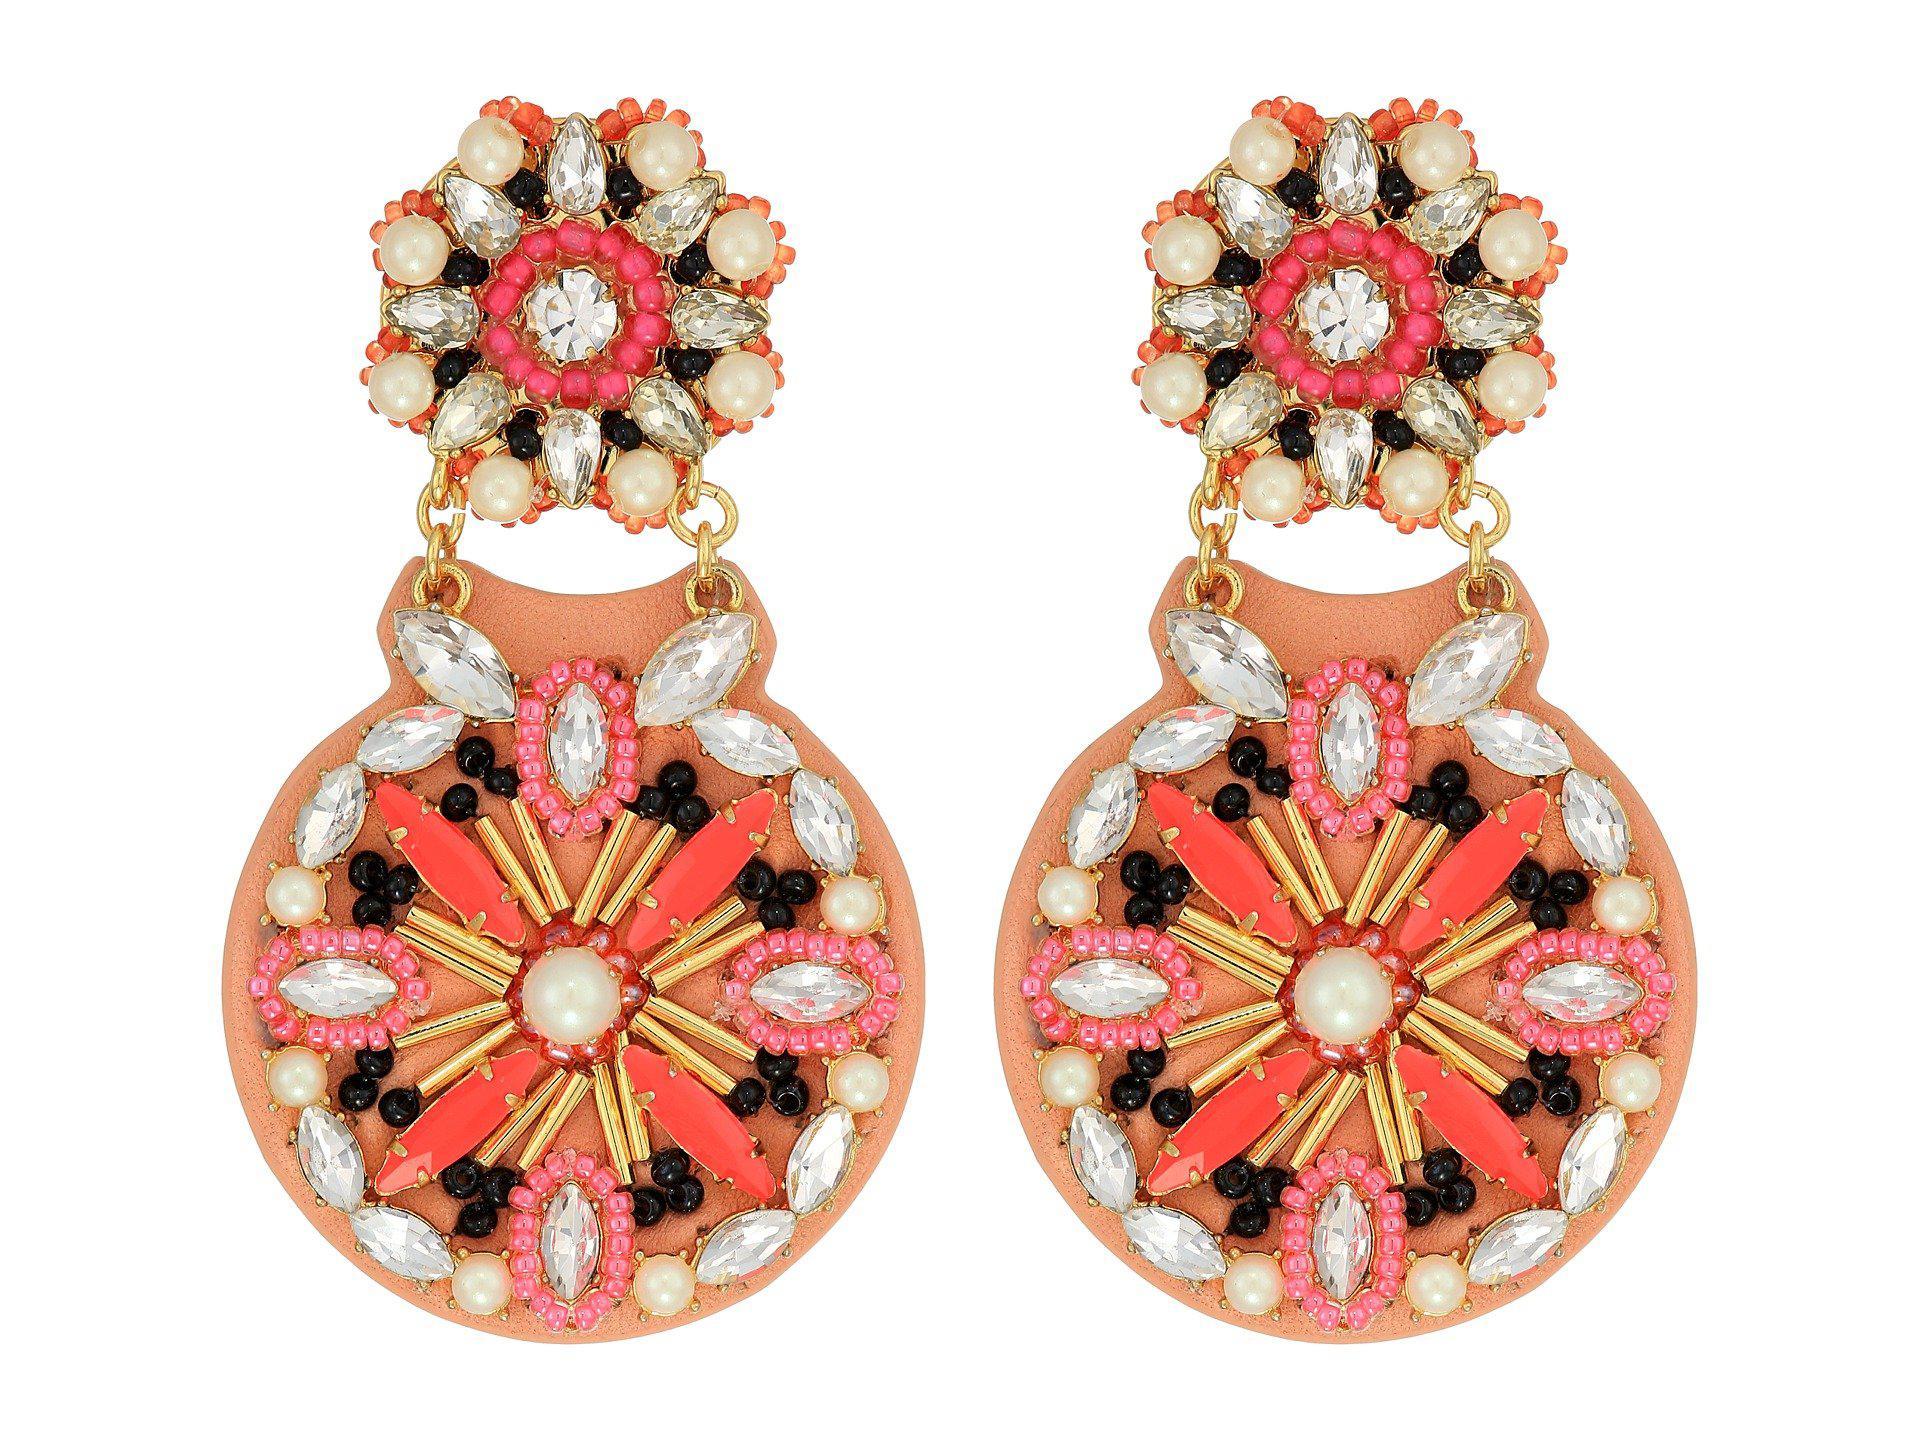 Kate Spade New York Desert Garden Drop Earrings cTOVhAx